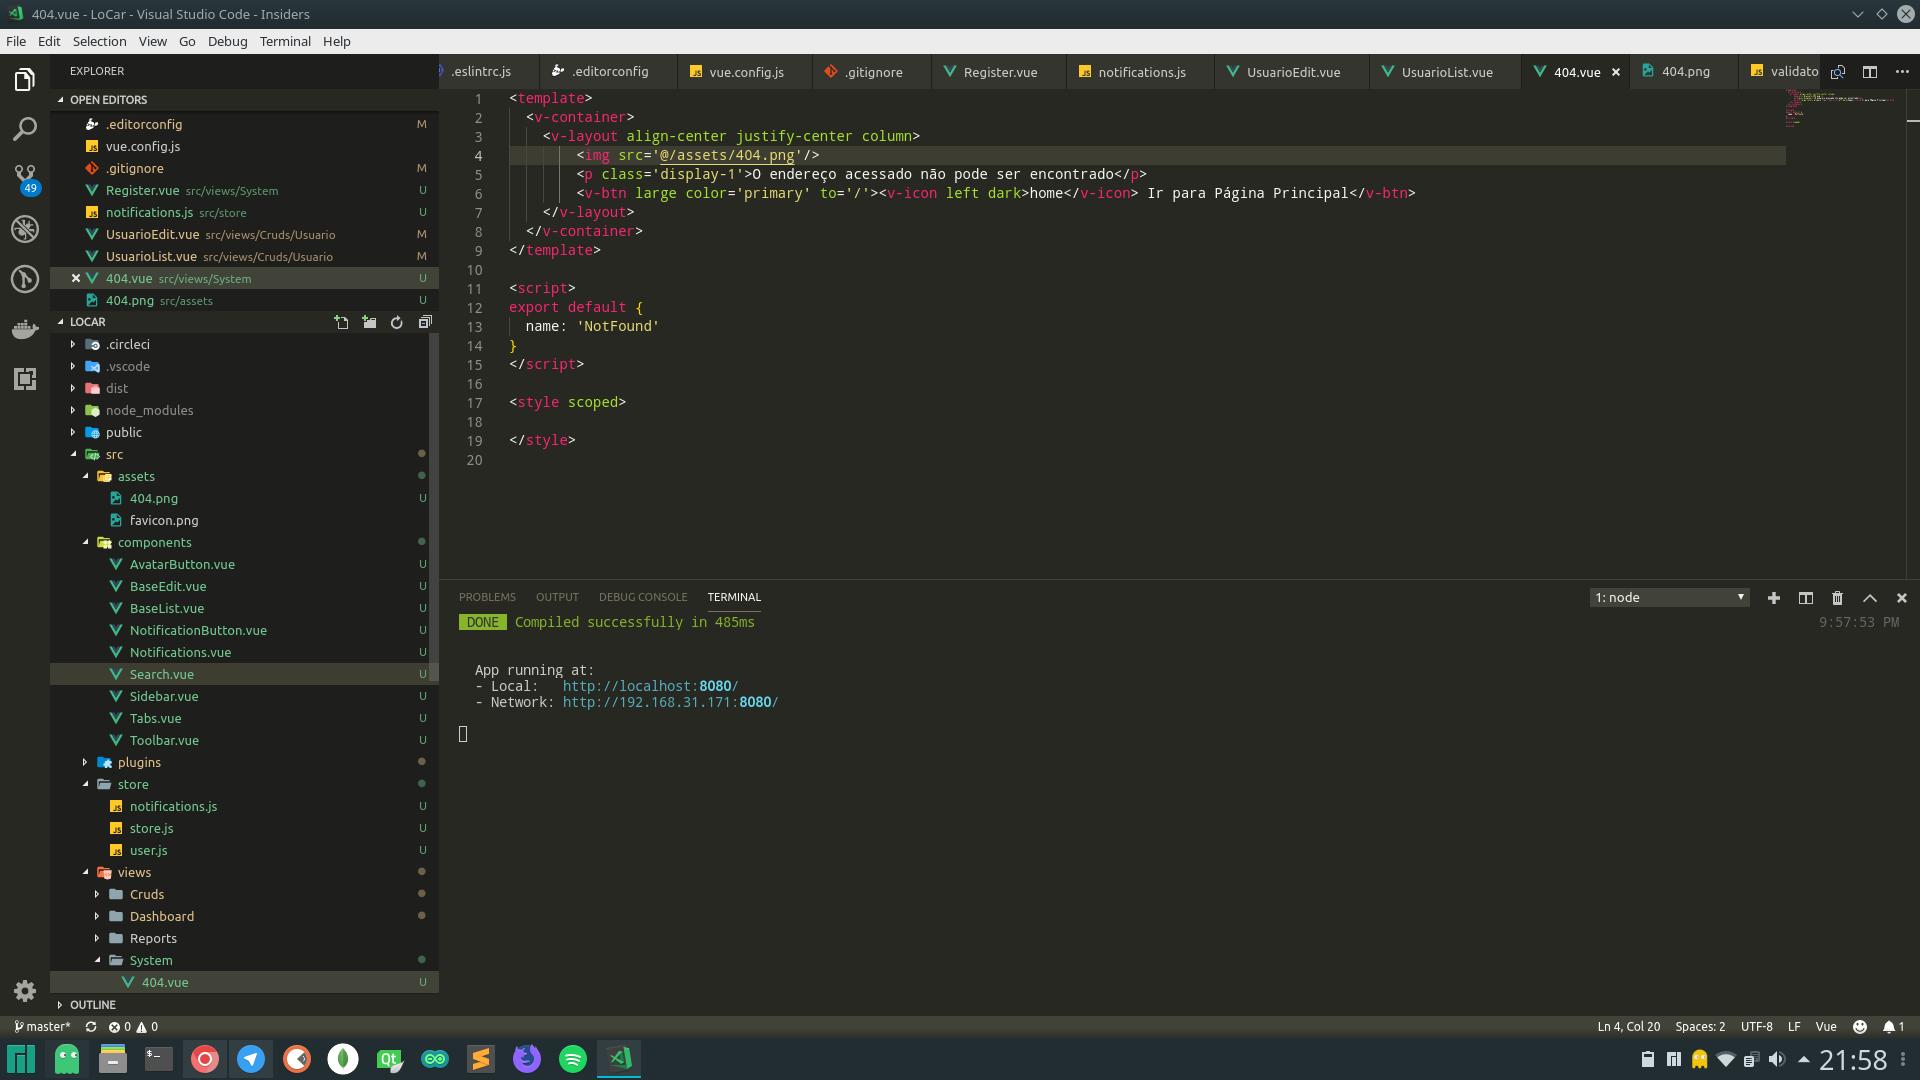 Visual Studio Code - Vscode | Linux - Manjaro/Arch